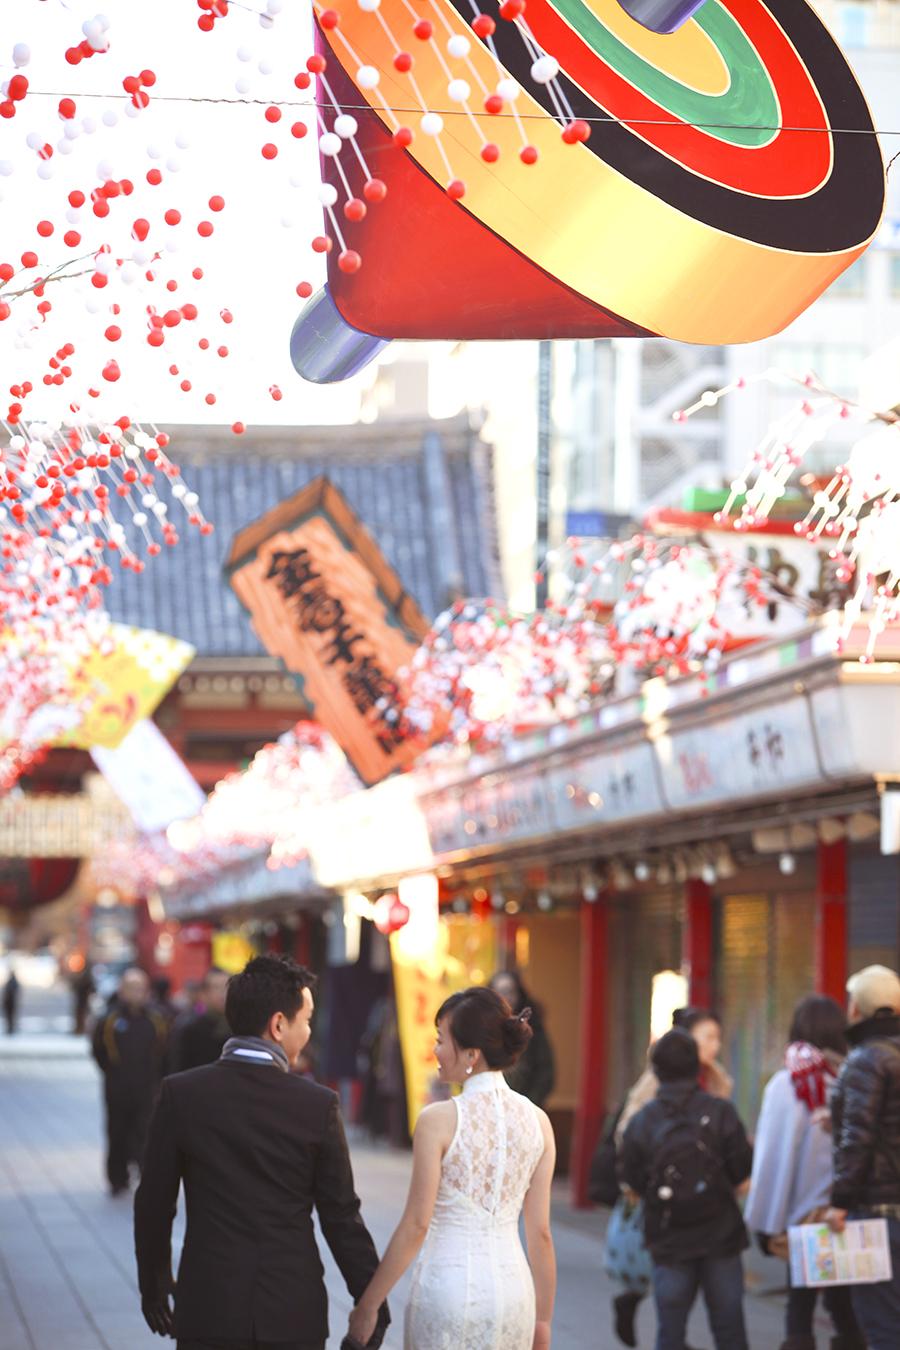 hokkaido tokyo japan . wedding photography by kurt ahs . 5086.jpg